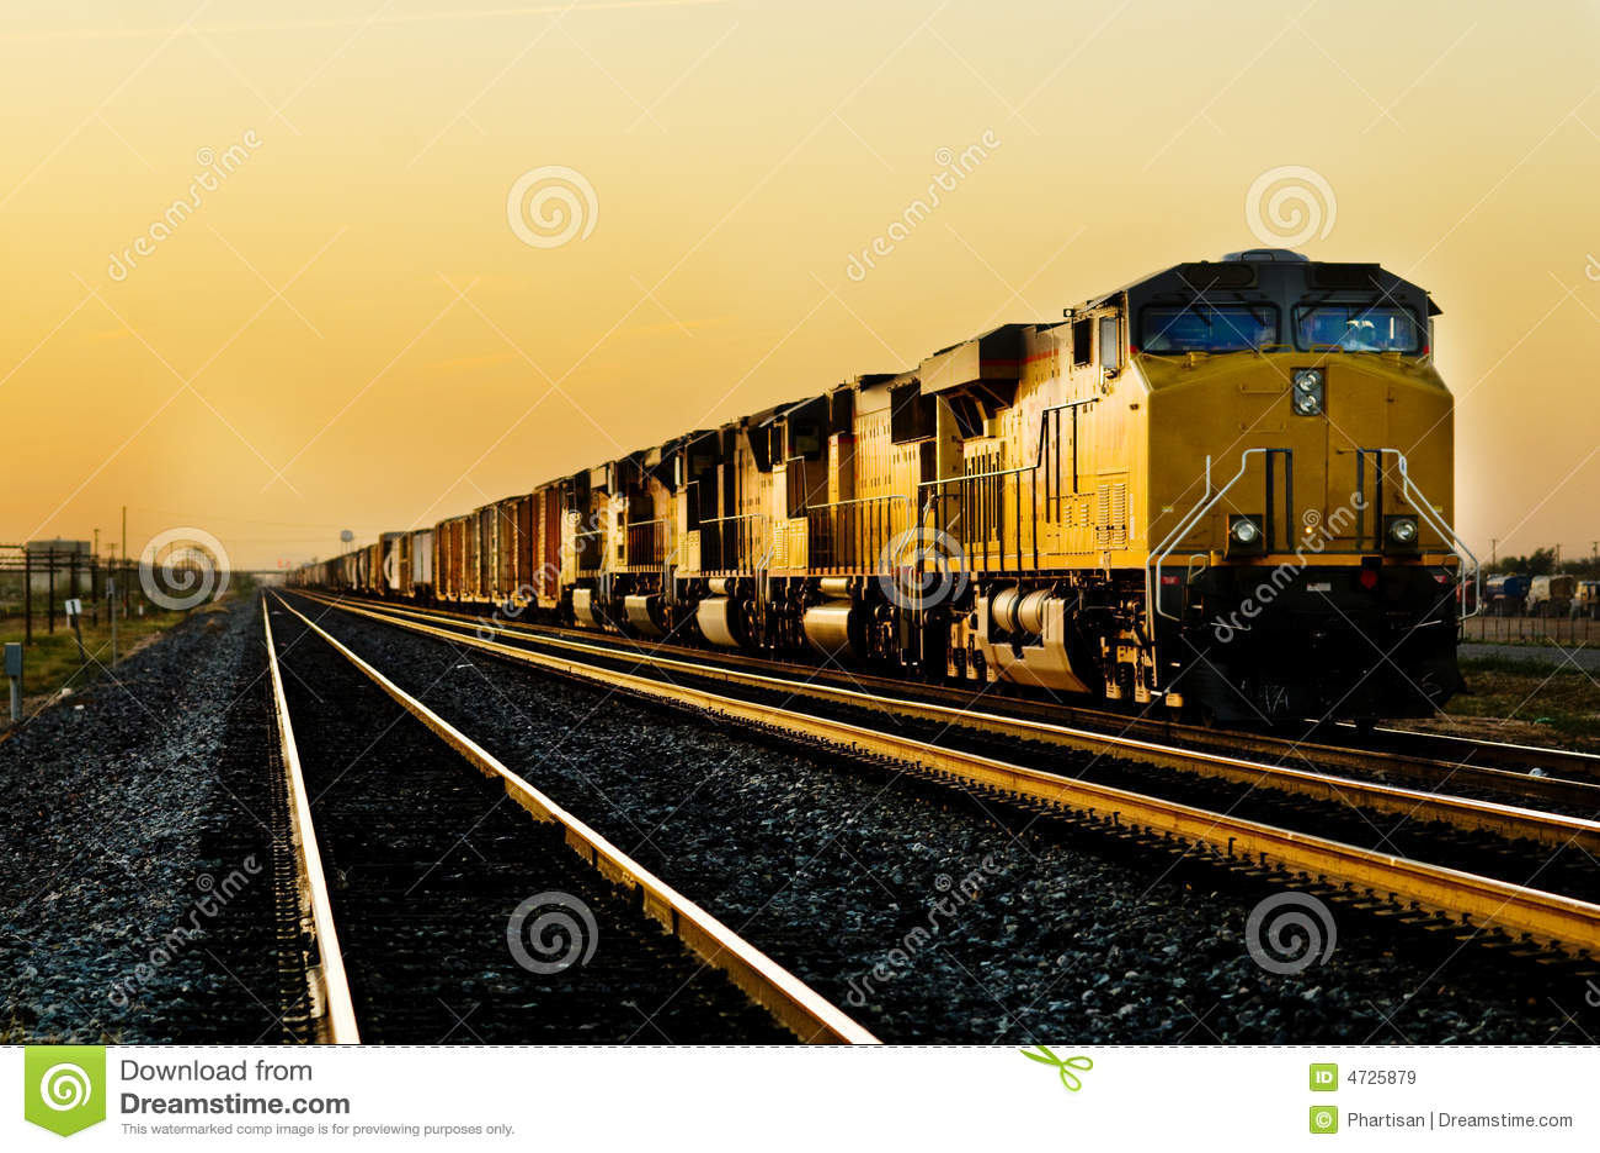 Train locomotive traveling through desert